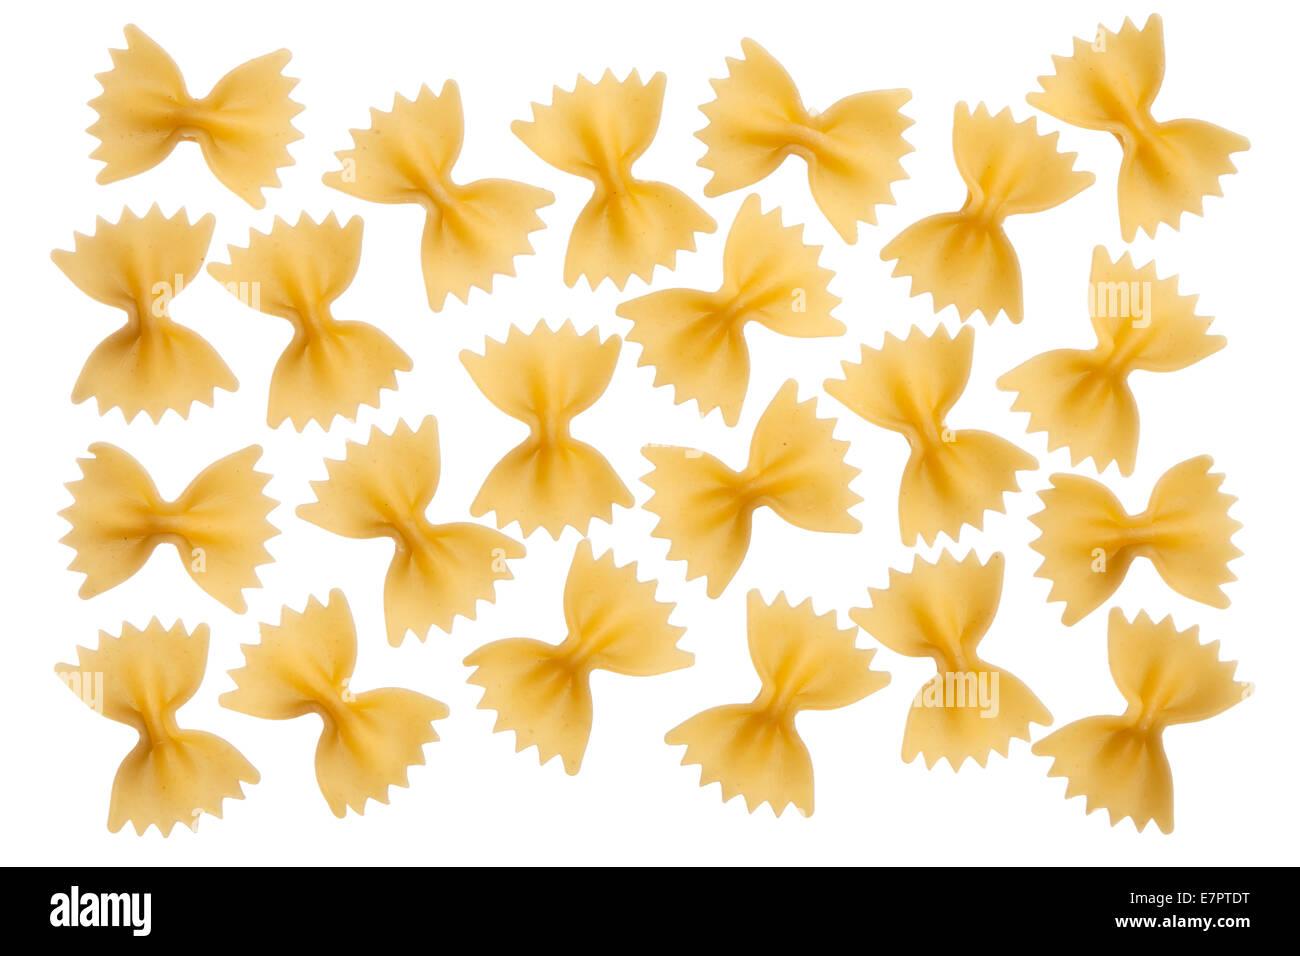 L'Italien pâtes crues farfalle, noeud papillon, papillon Photo Stock